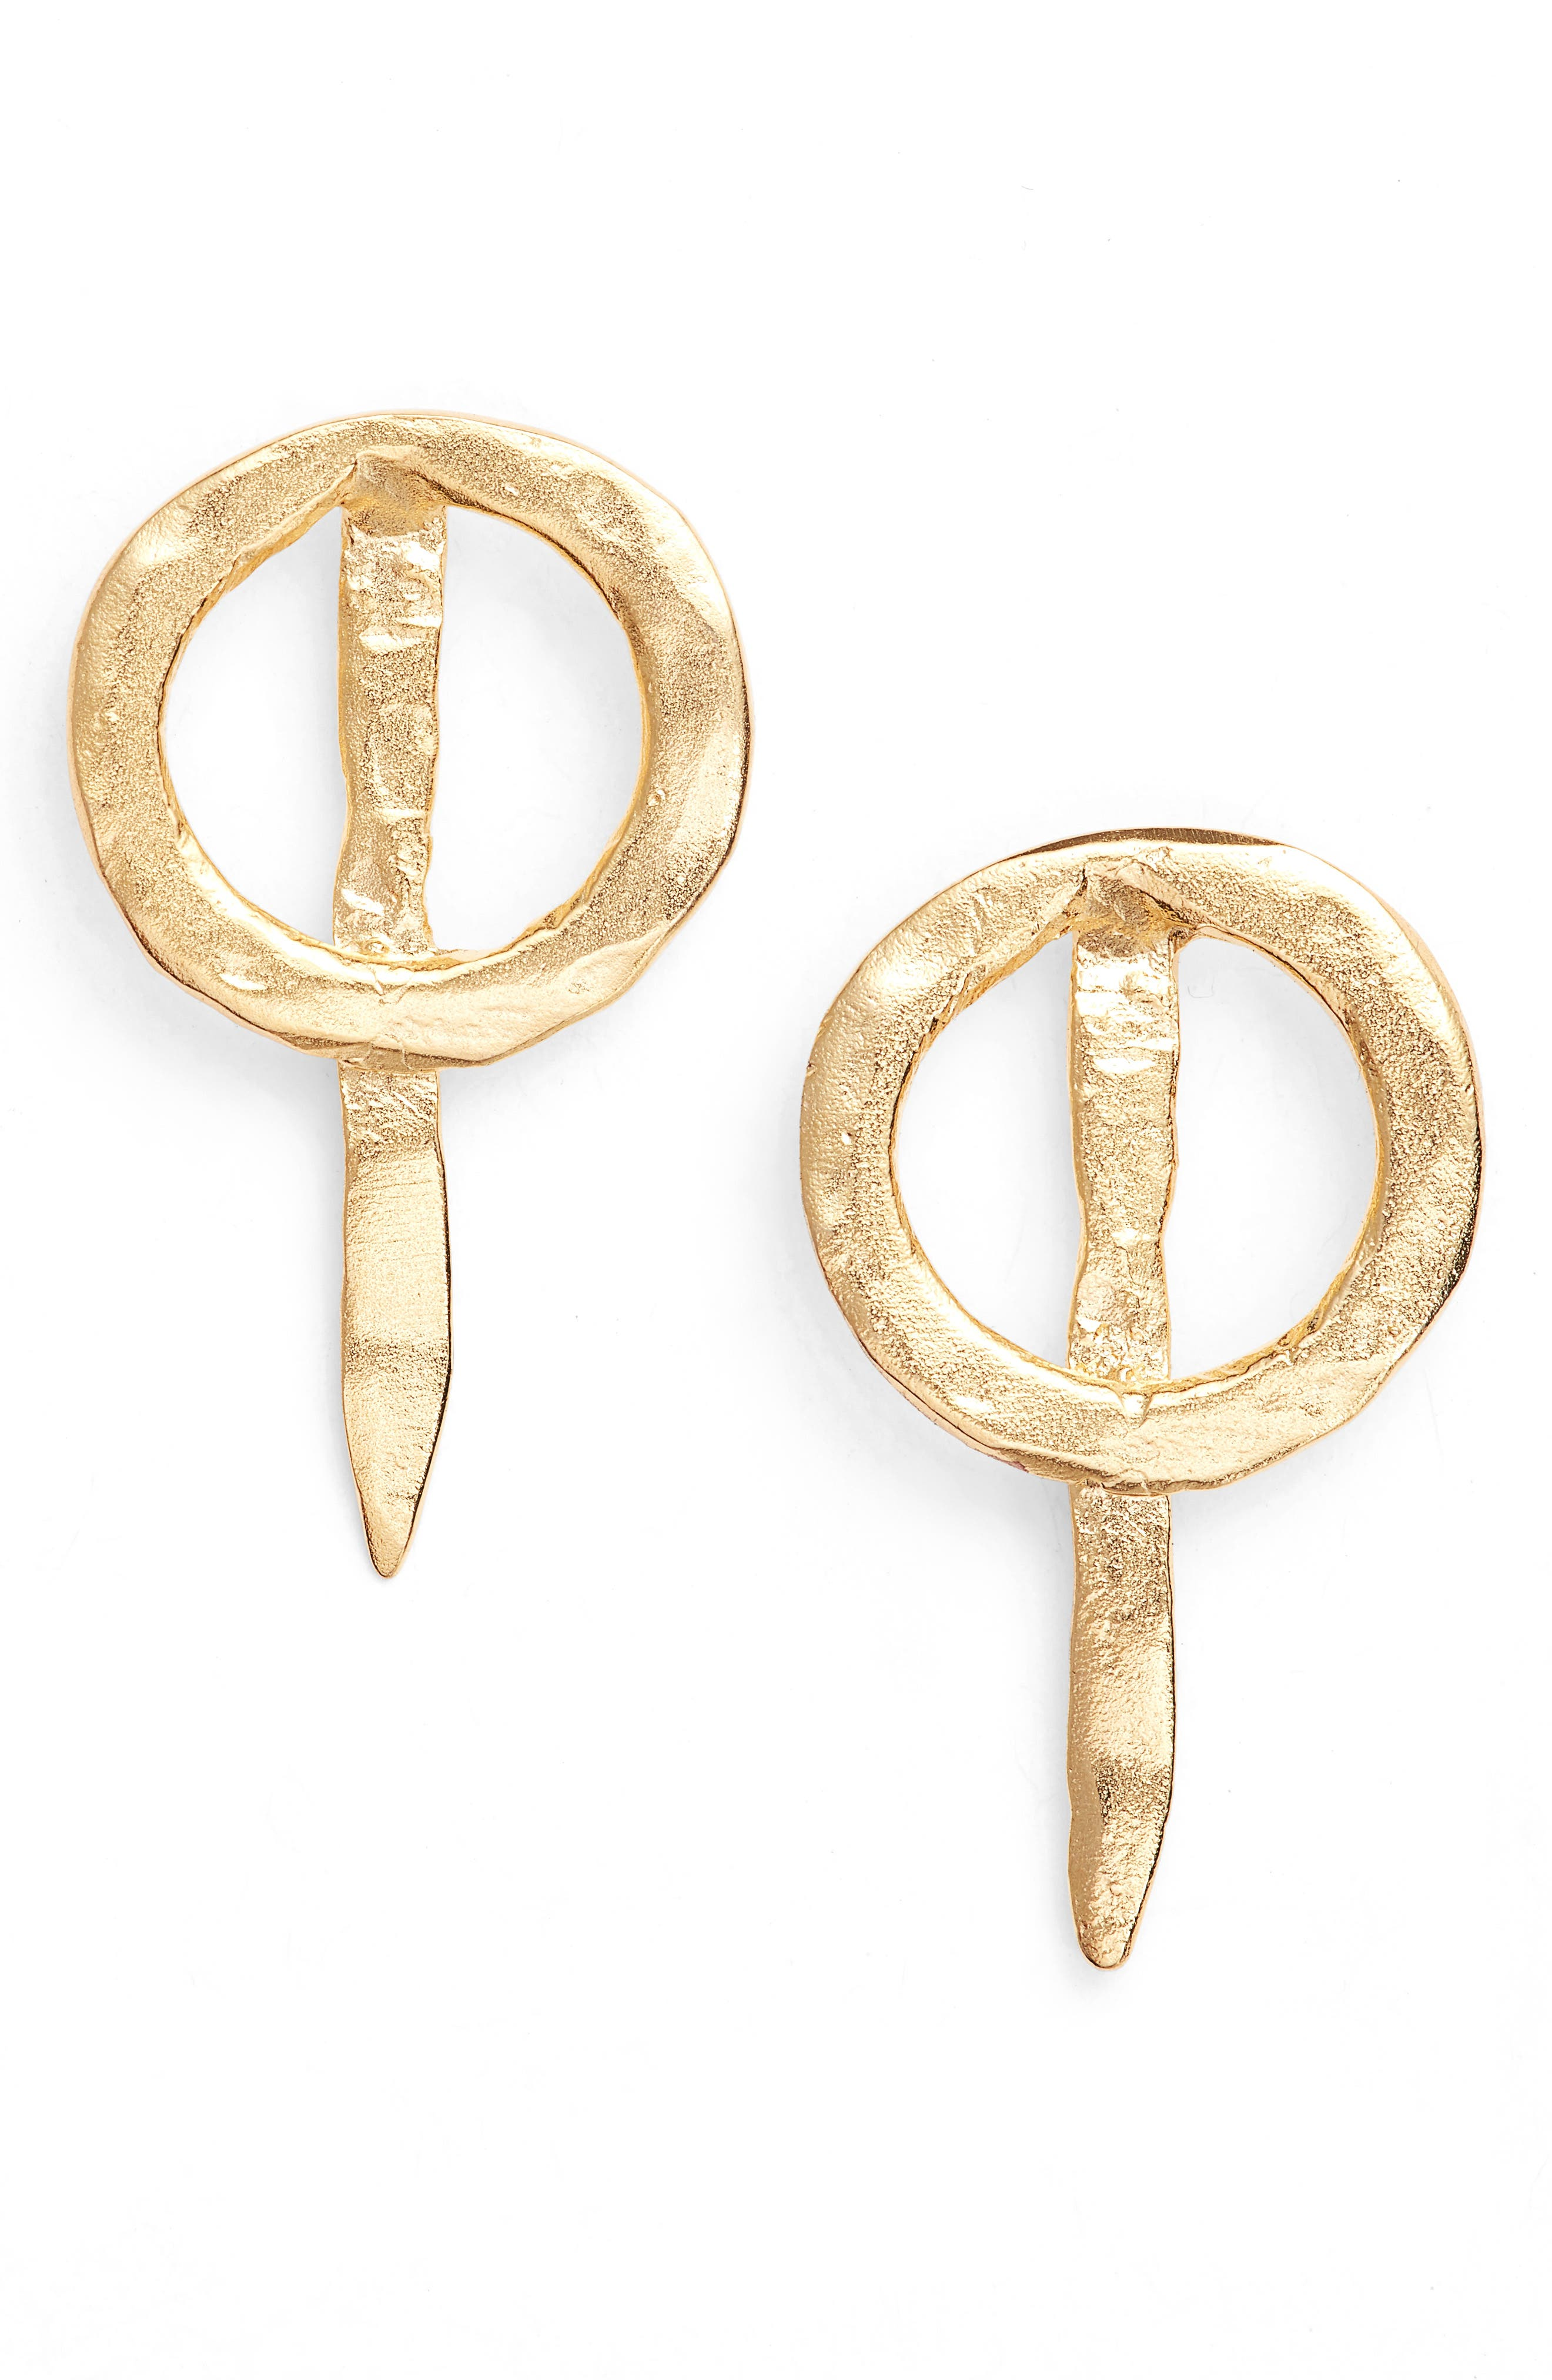 Britt Bolton Thorn Drop Earrings